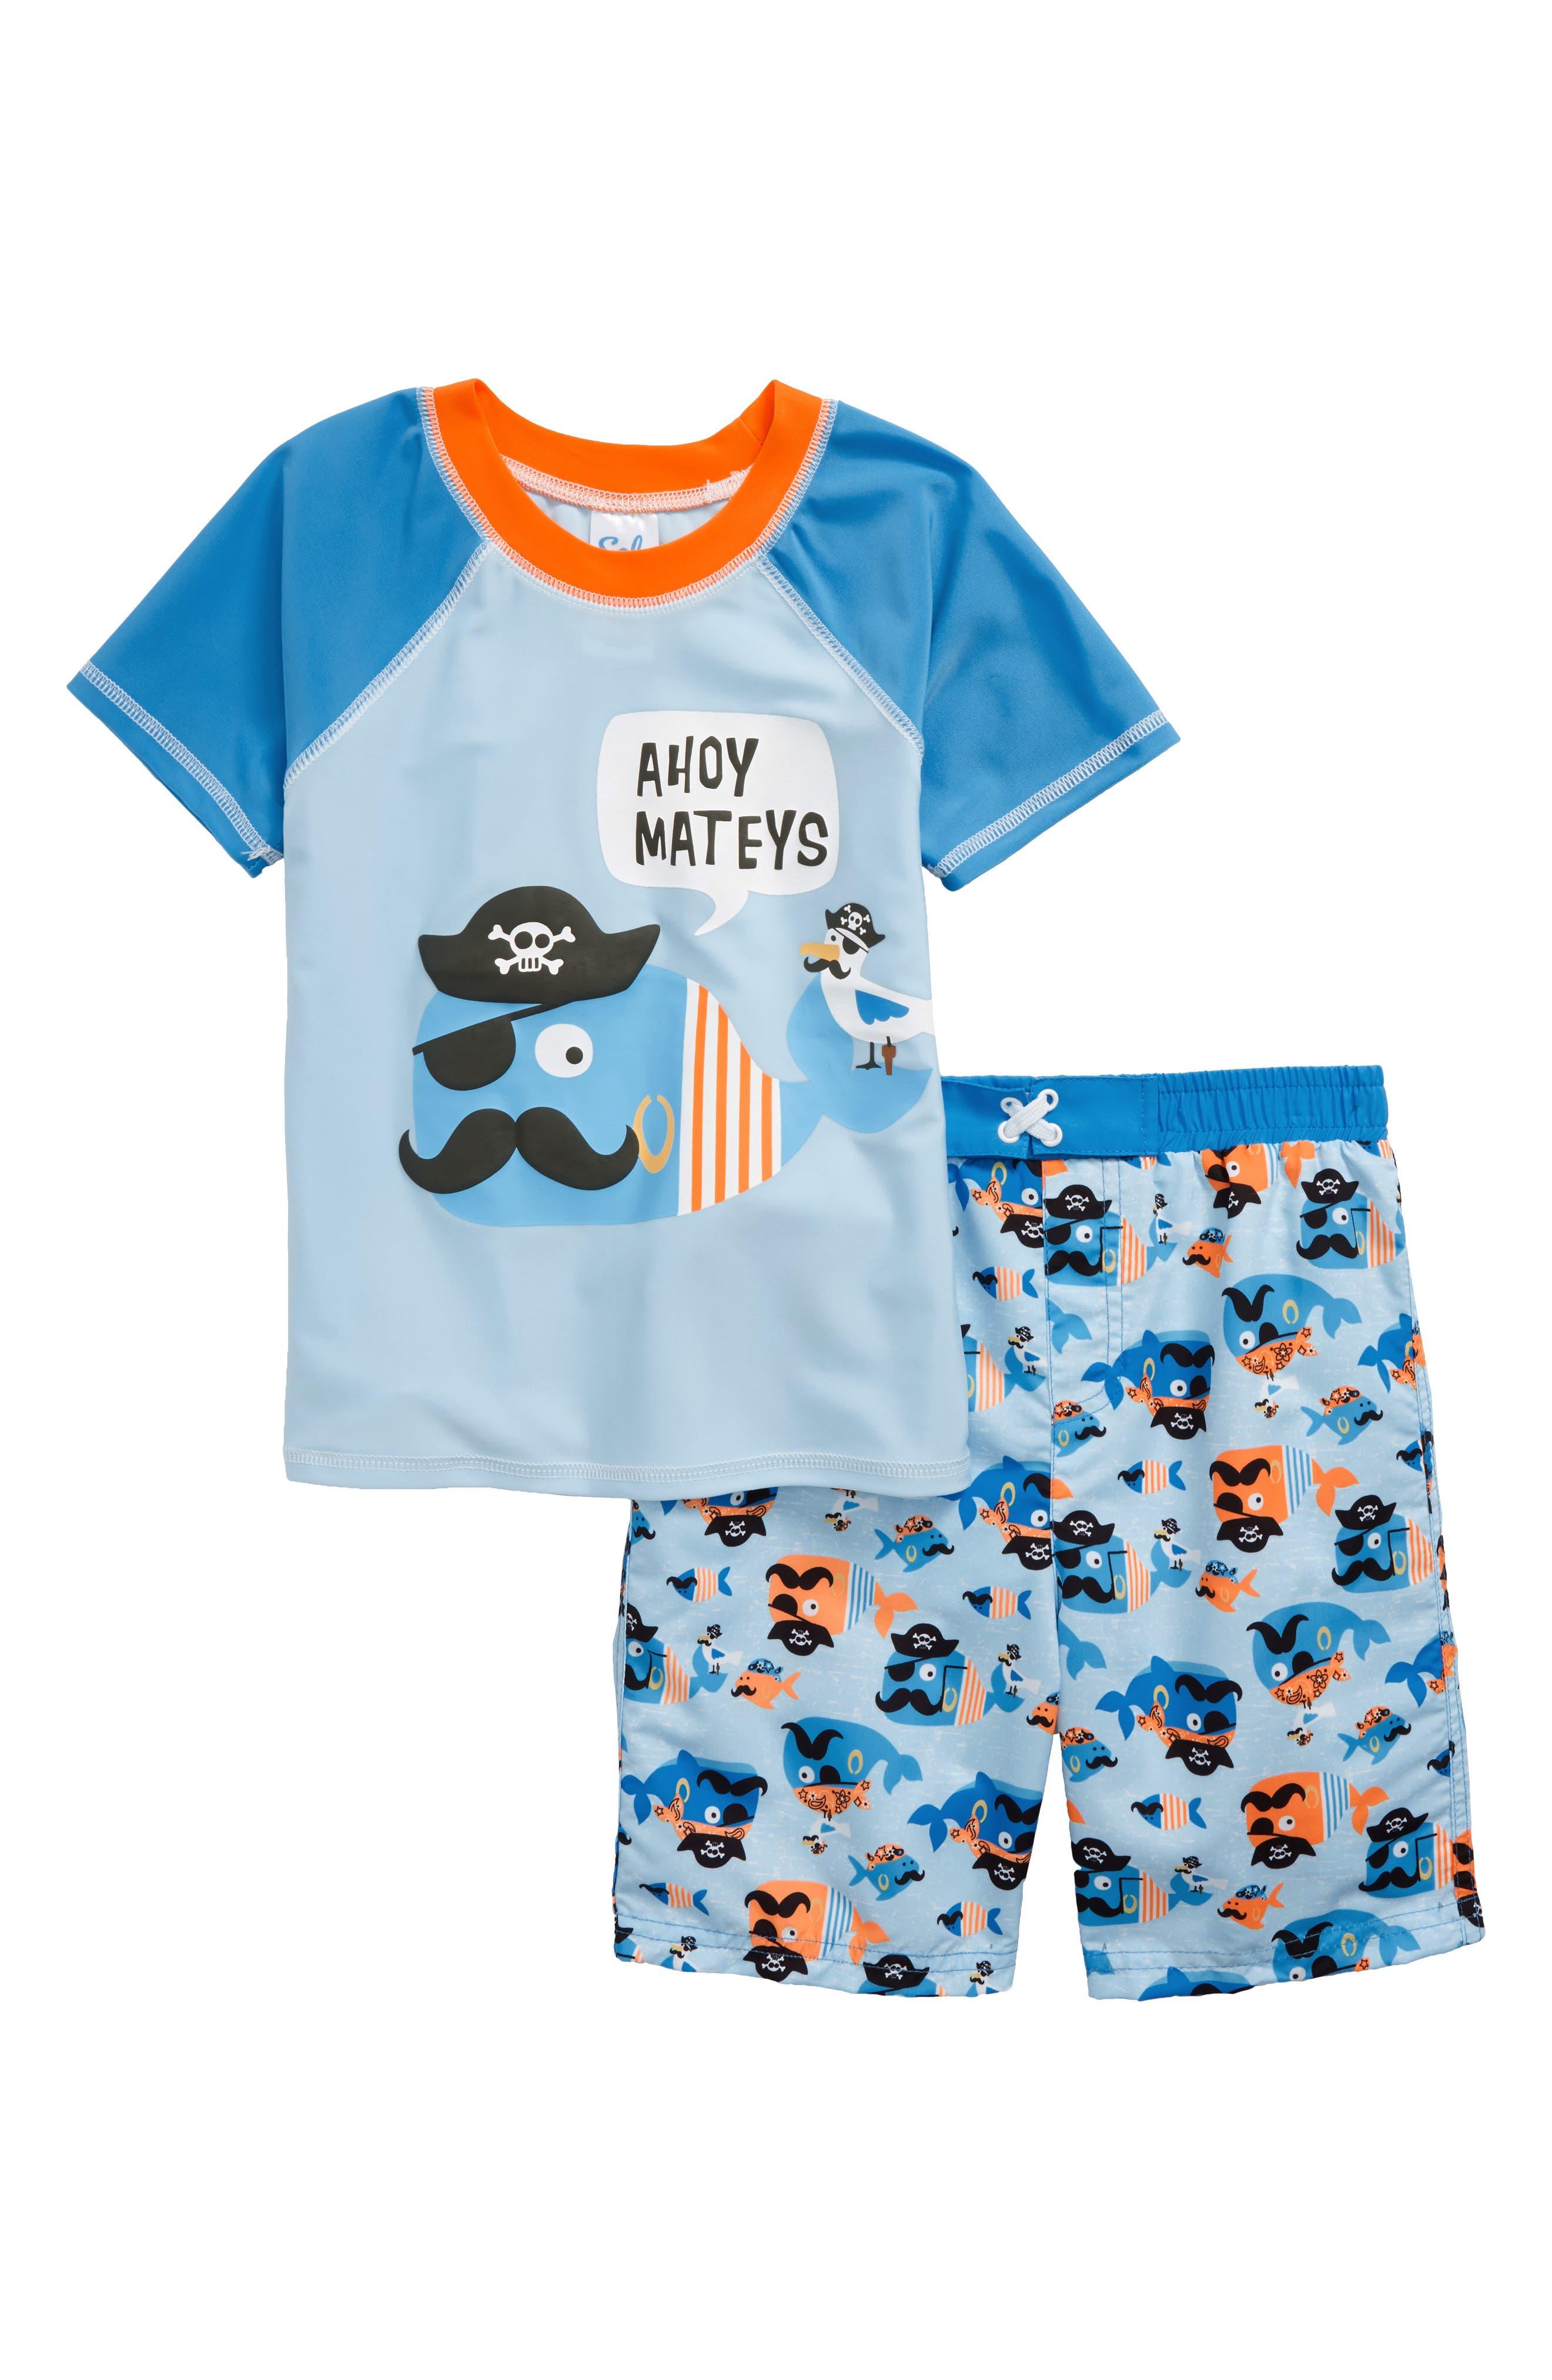 Alternate Image 1 Selected - Sol Swim Ahoy Mateys Two-Piece Rashguard Swimsuit (Toddler Boys & Little Boys)